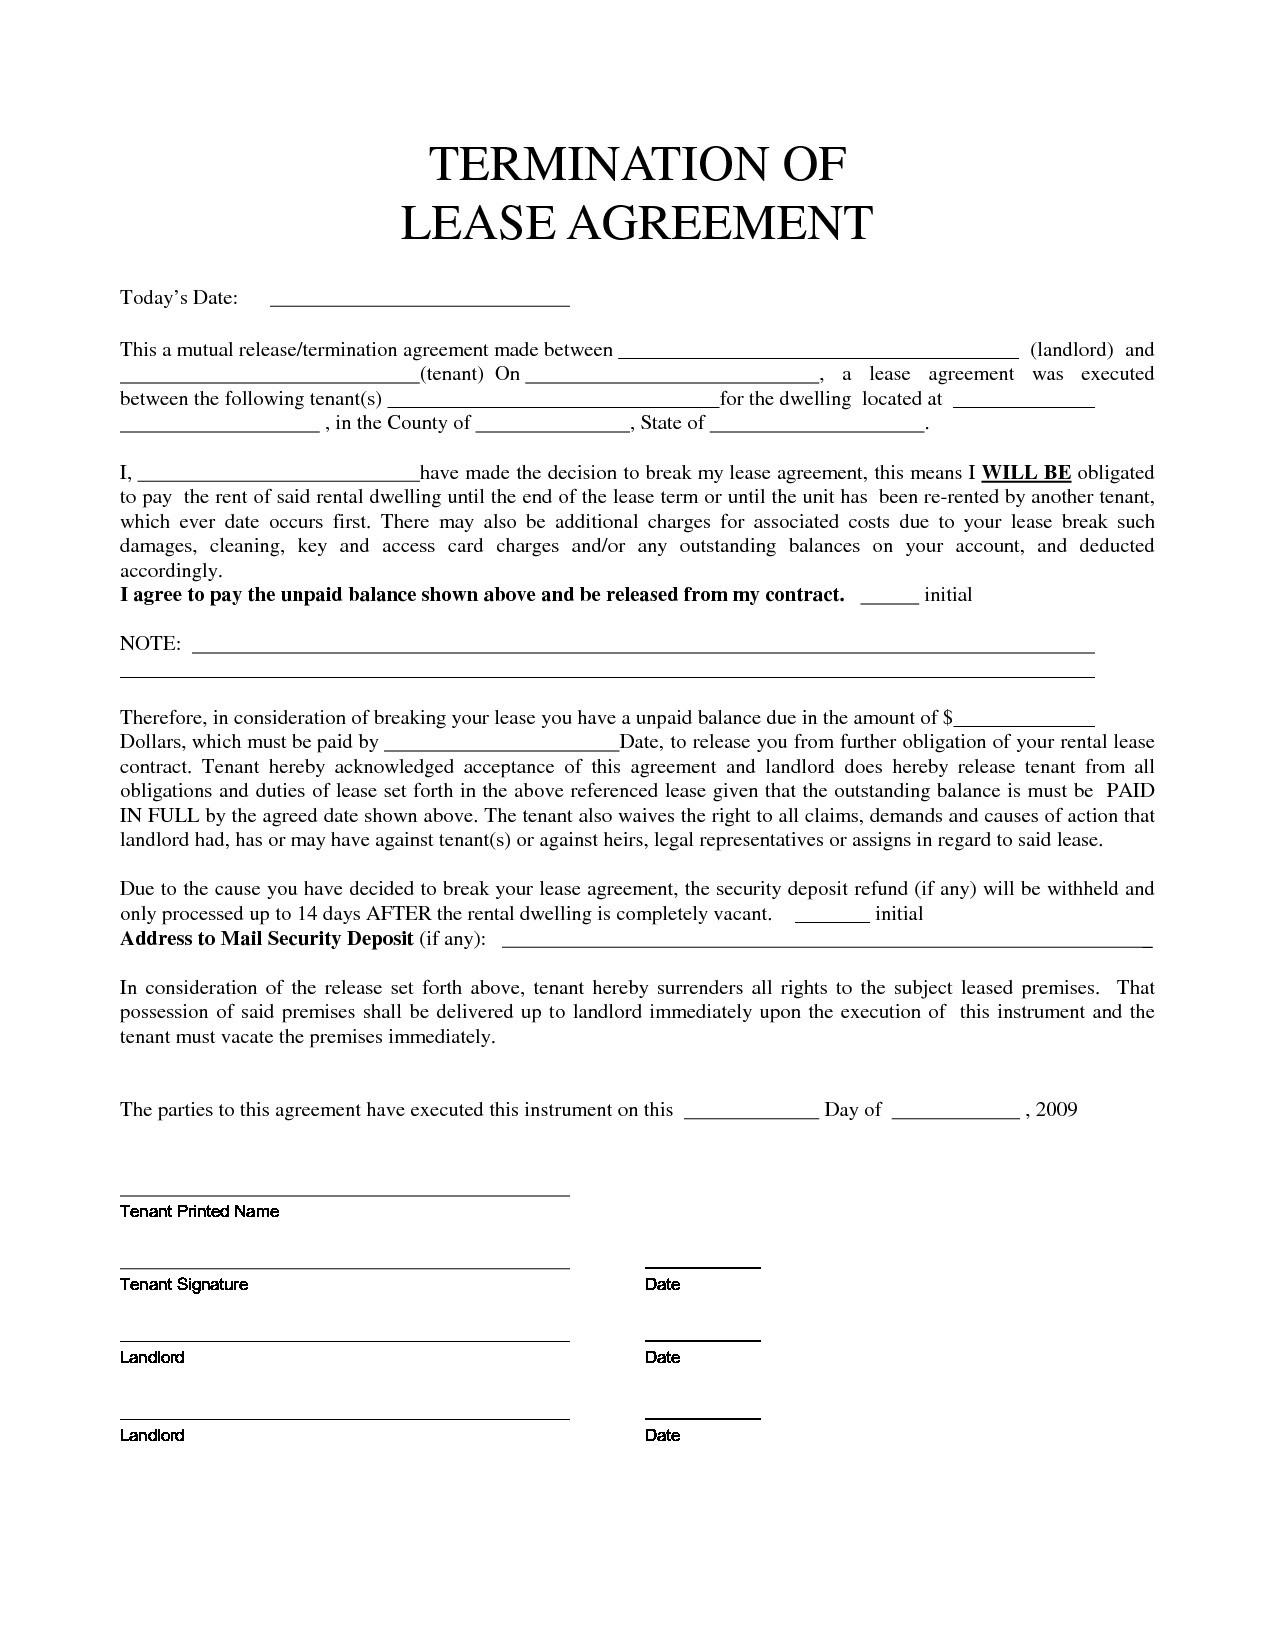 Termination Of Rental Agreement Form Early Termination Of Lease Agreement Template Templates Resume Examples Xla7bweyej